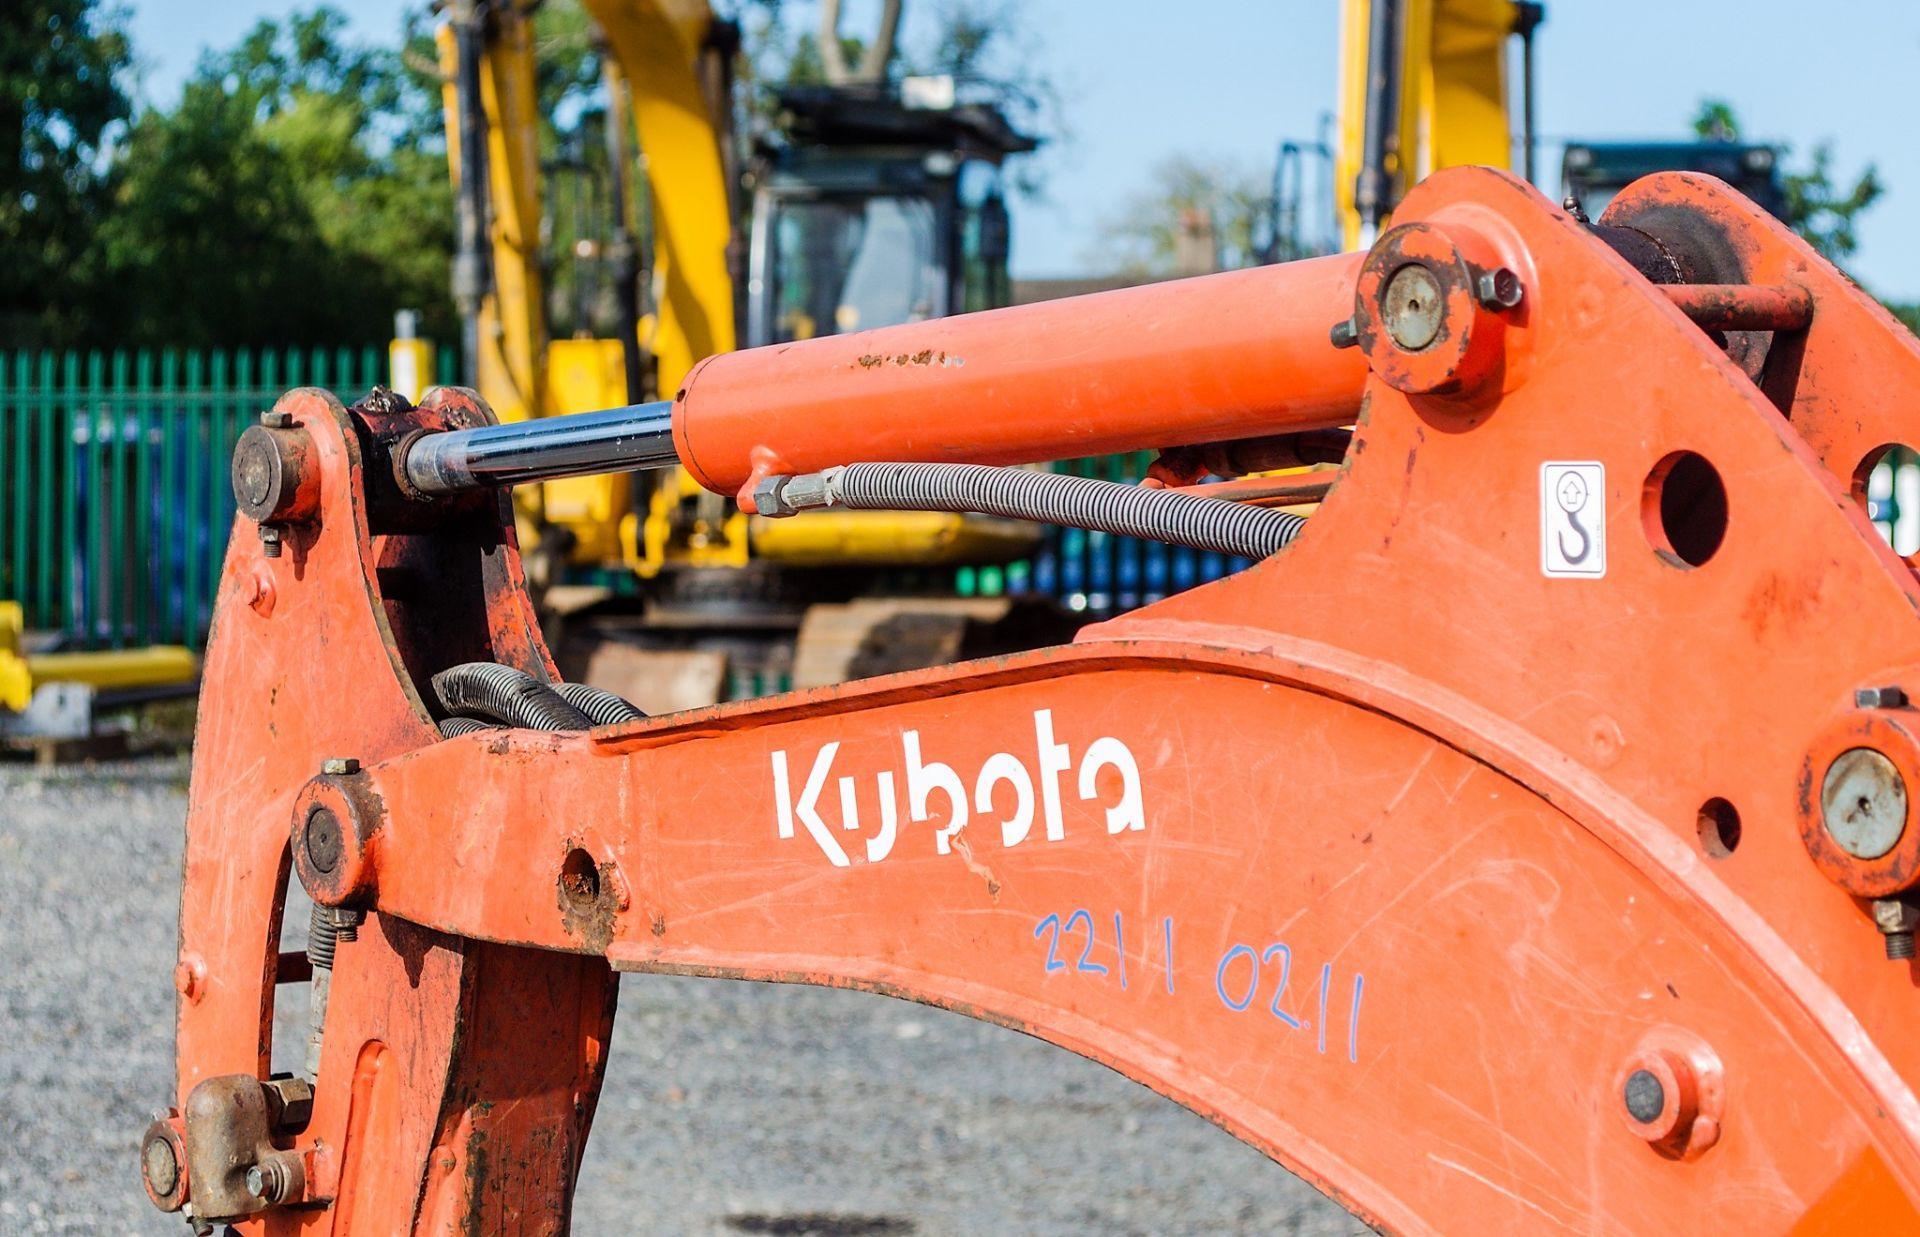 Kubota KX36-3 1.5 tonne rubber tracked mini excavator Year: 2007 S/N: Z077298 Recorded Hours: 4205 - Image 13 of 18